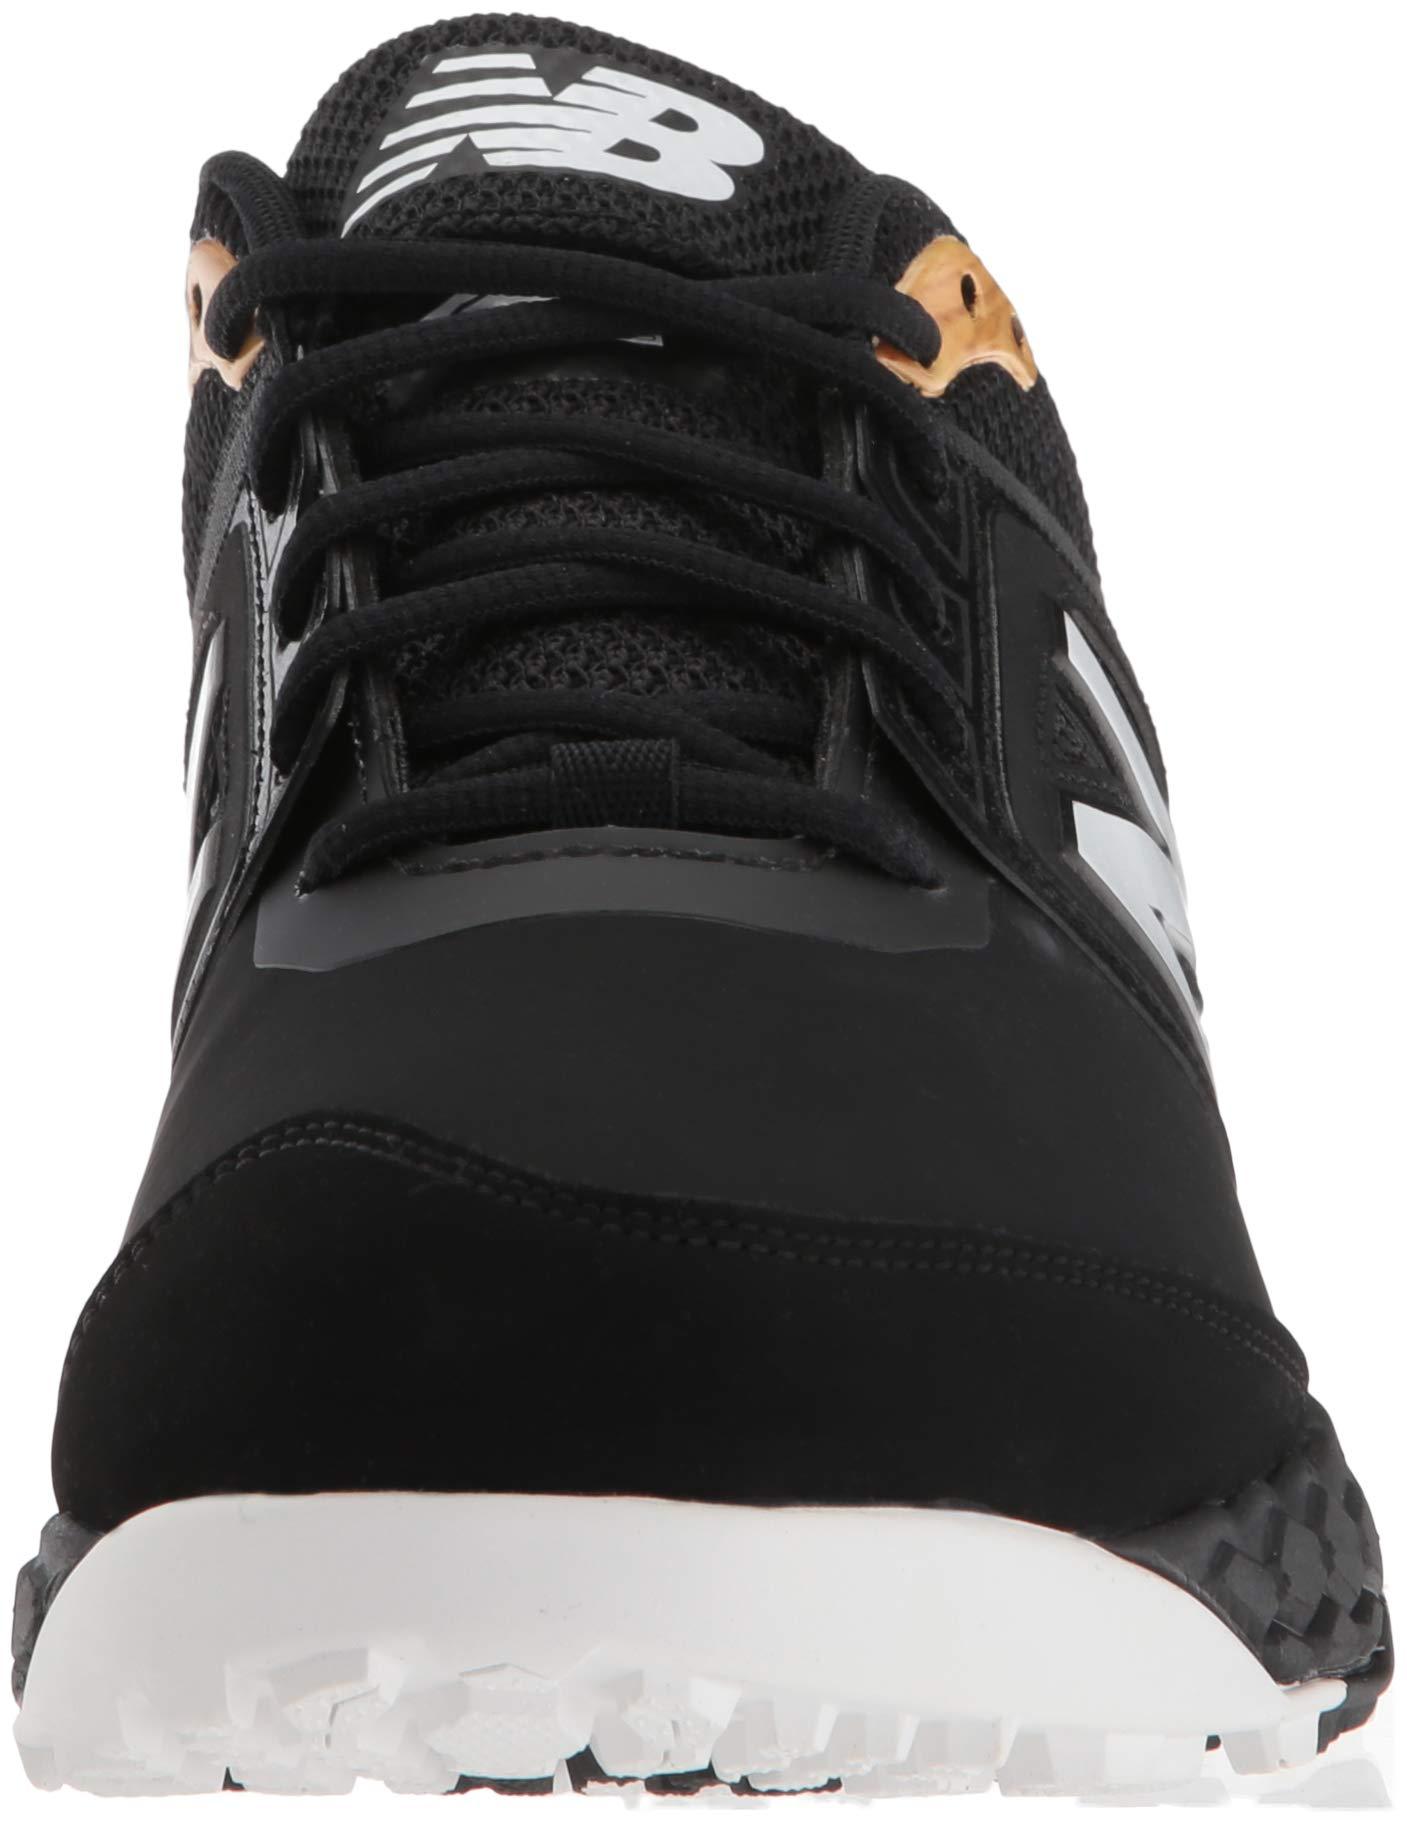 New Balance Men's 3000v4 Turf Baseball Shoe, Black, 5 D US by New Balance (Image #4)